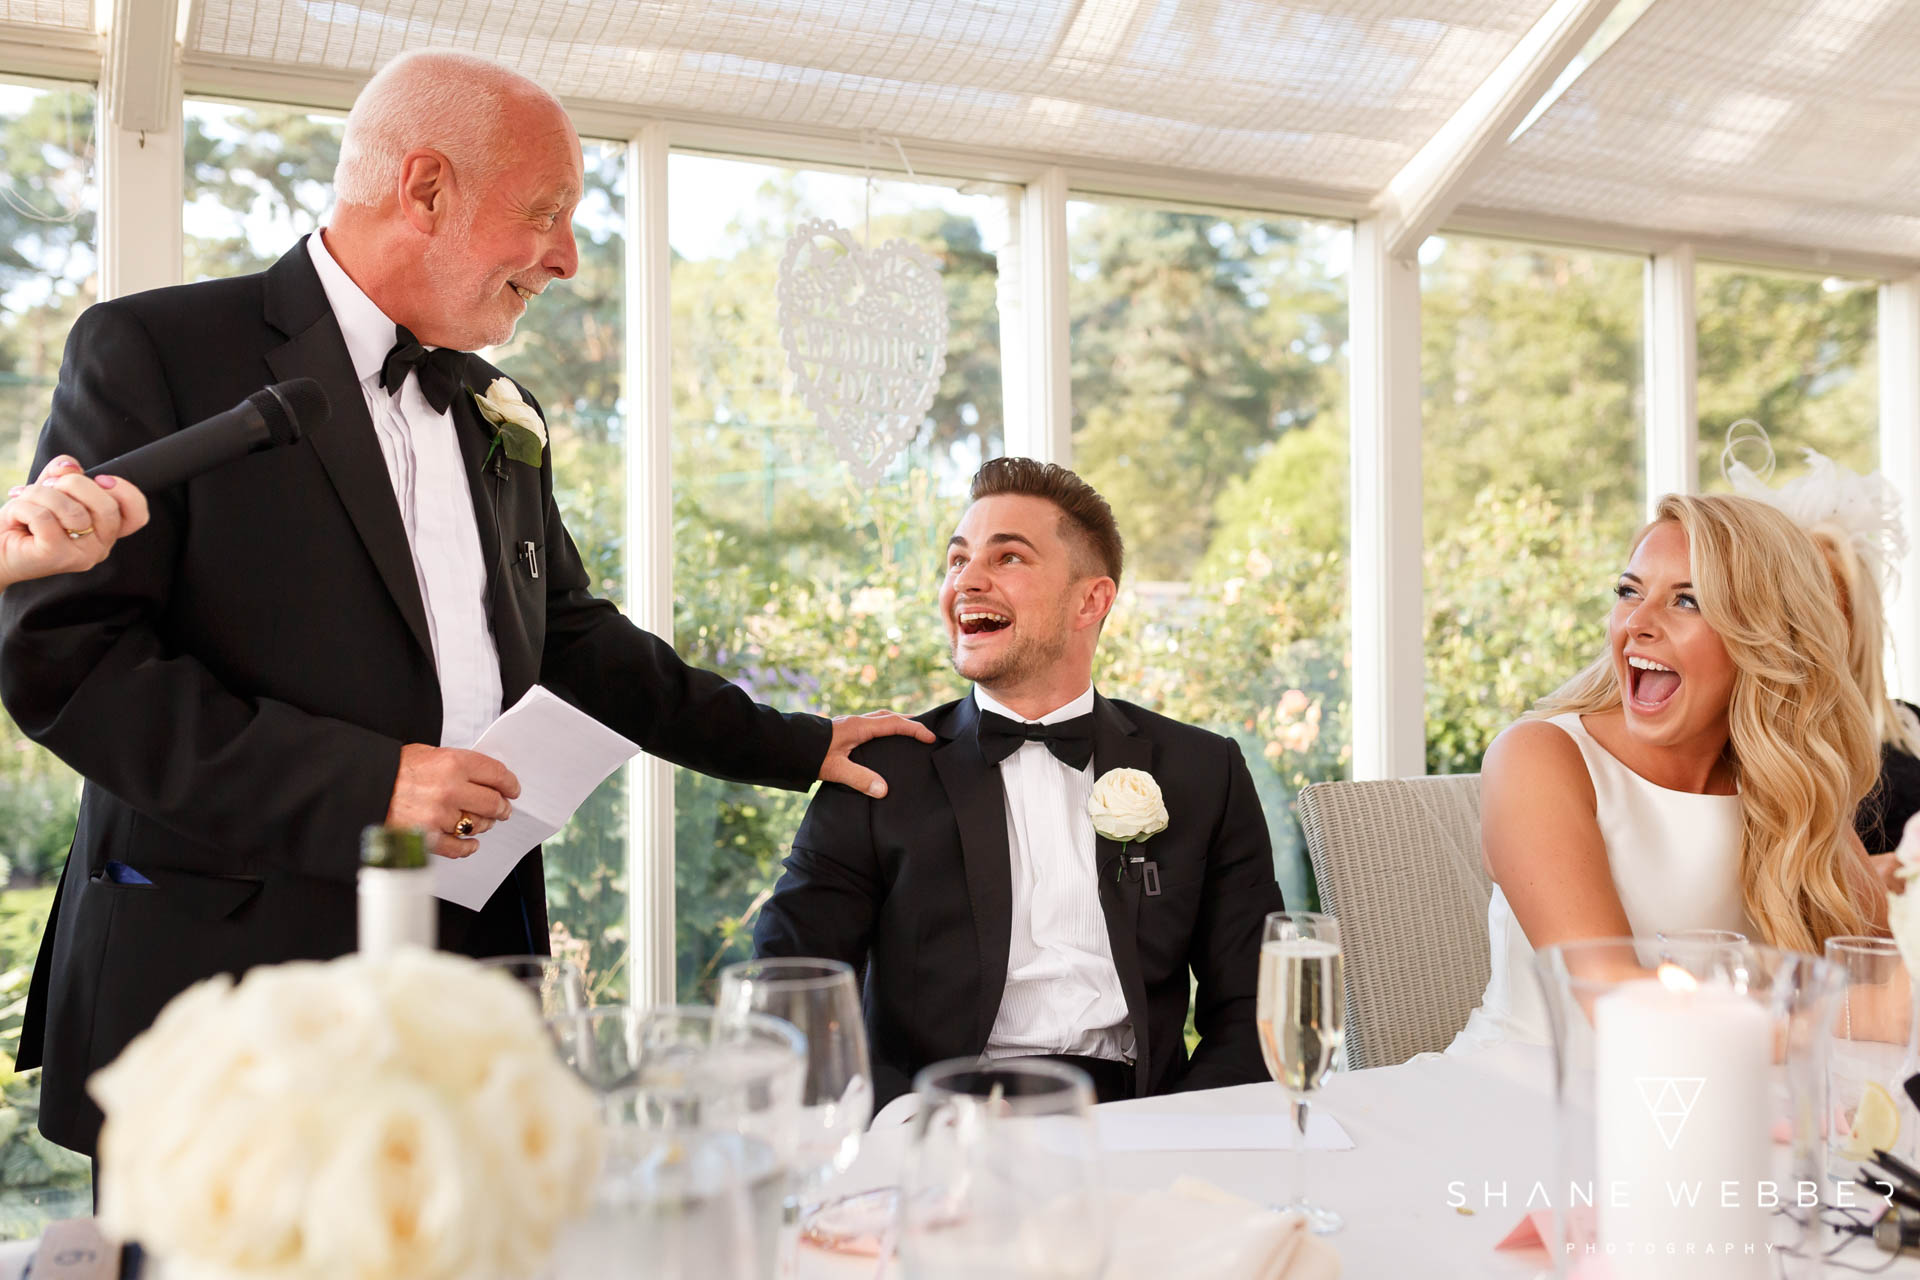 award winning wedding planner in Cheshire